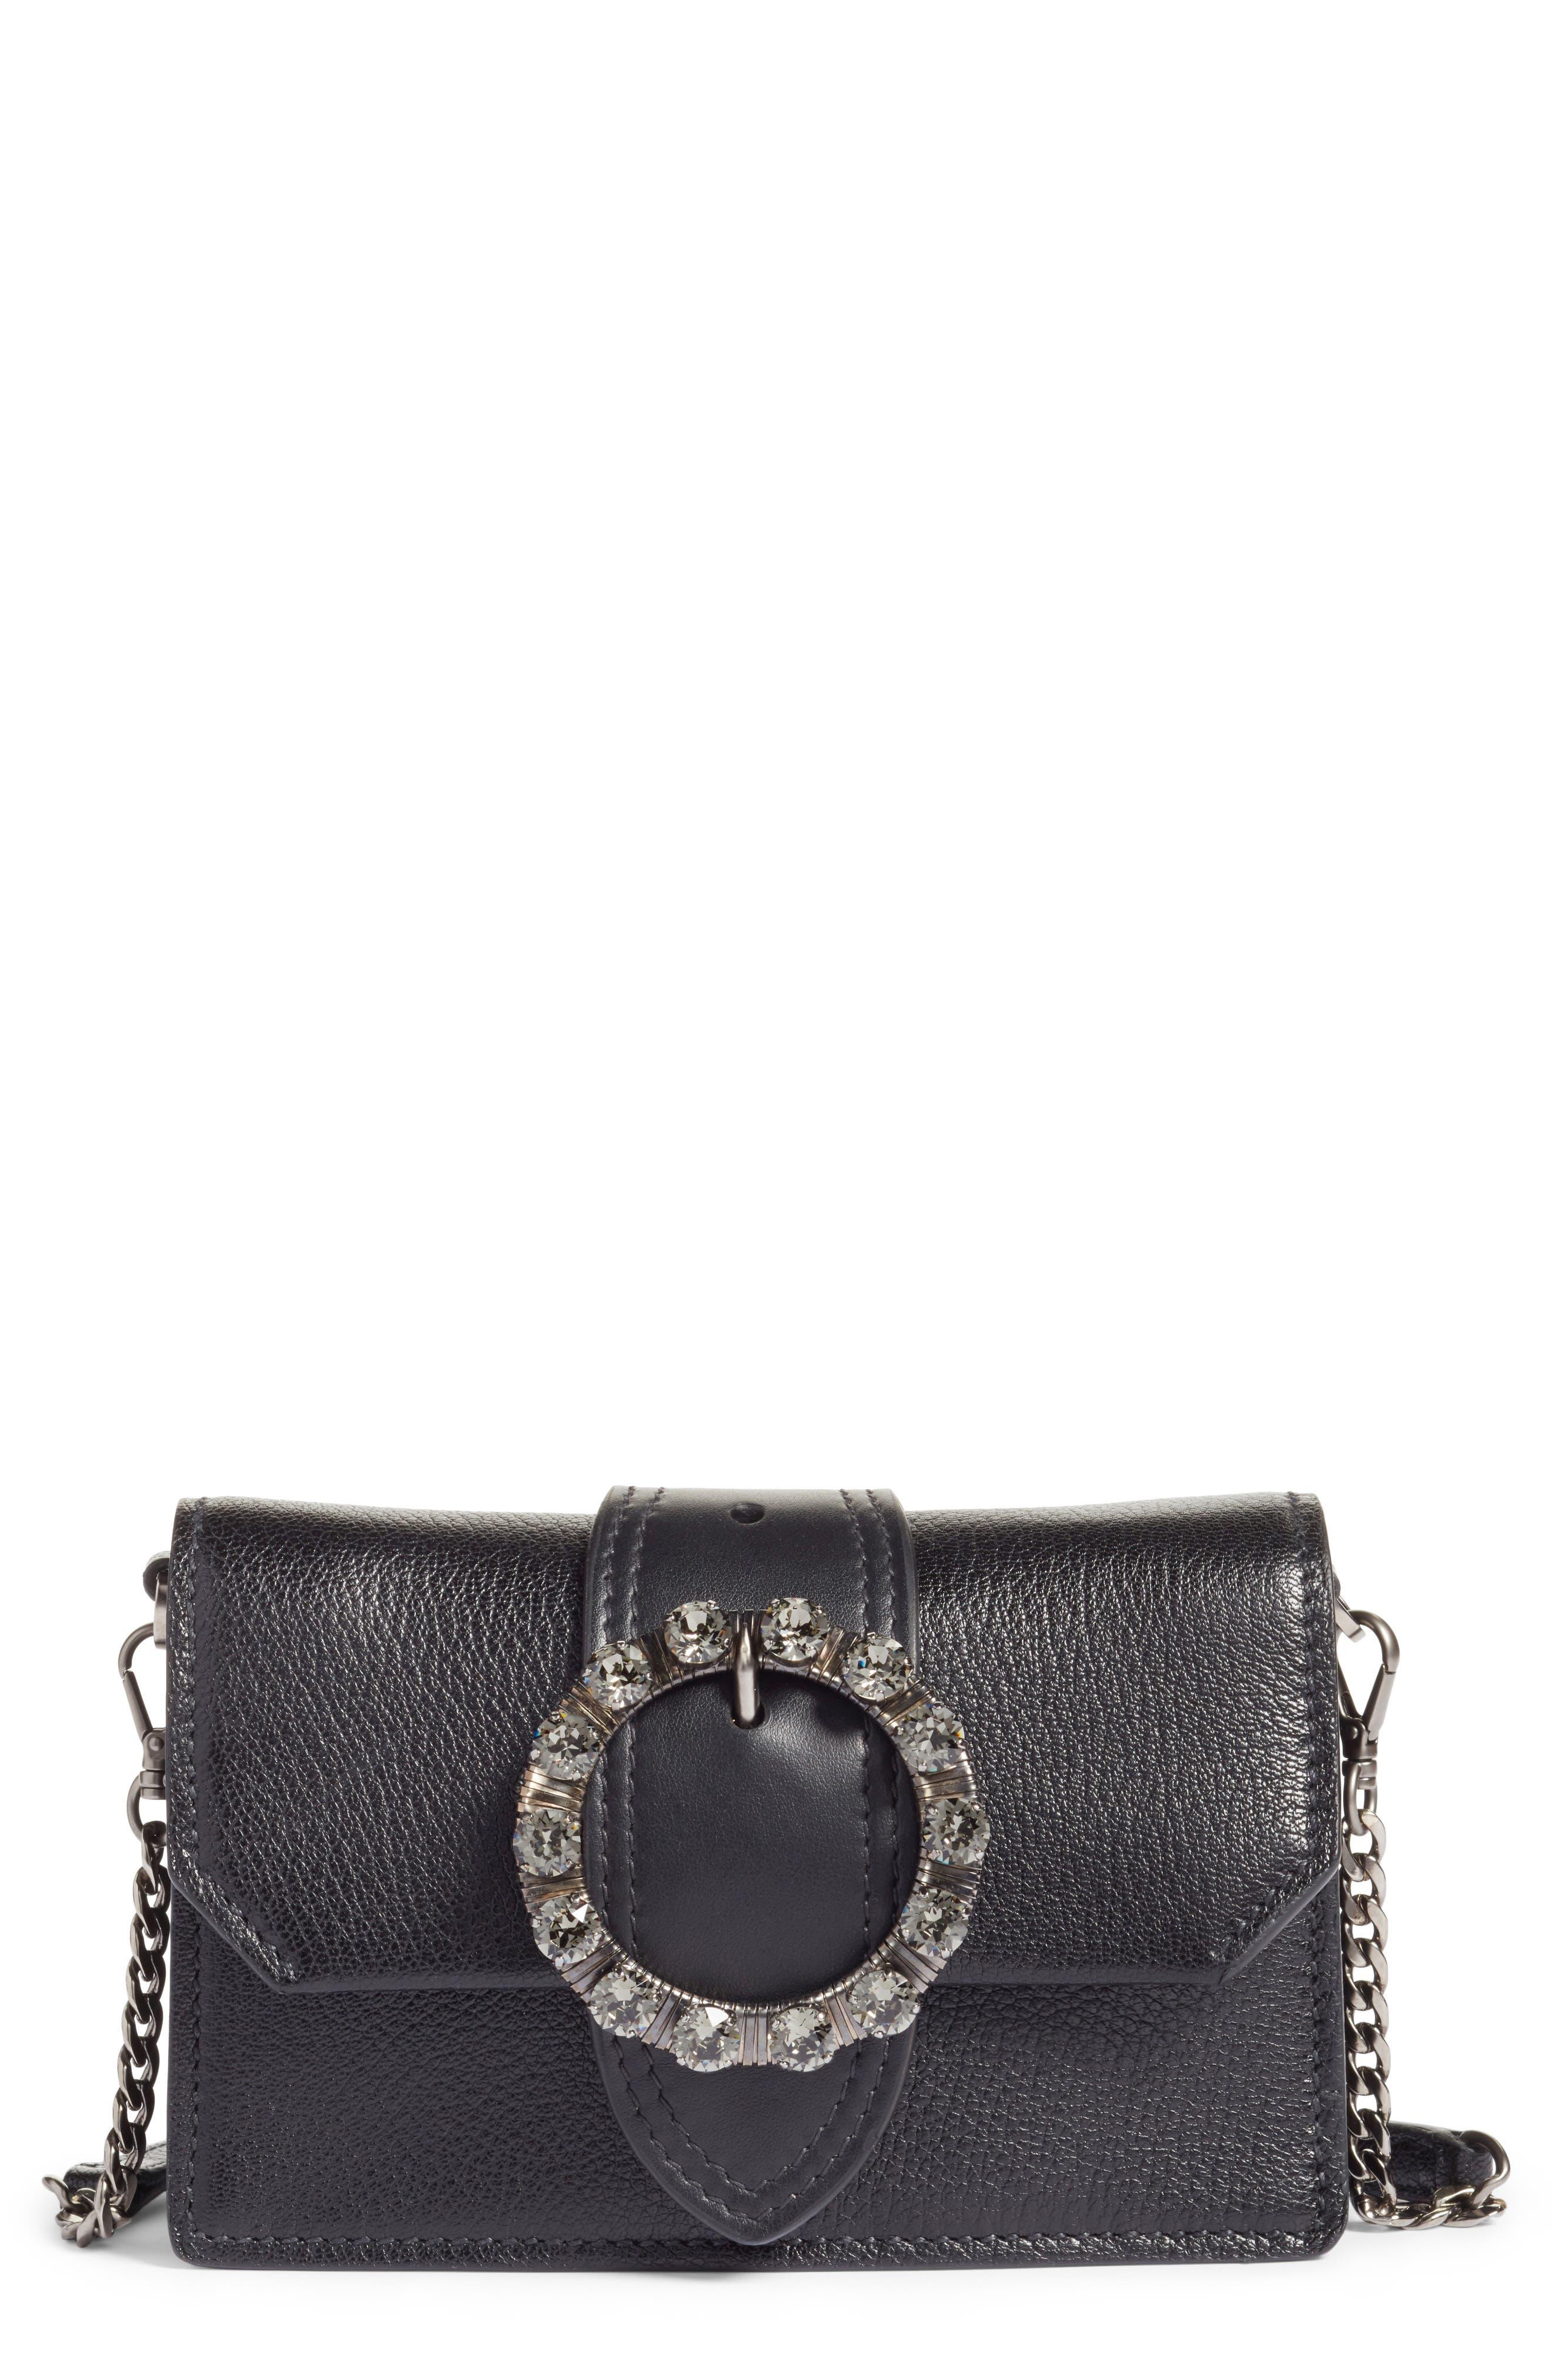 Lady Madras Crystal Embellished Leather Crossbody Bag,                             Main thumbnail 1, color,                             Nero 1